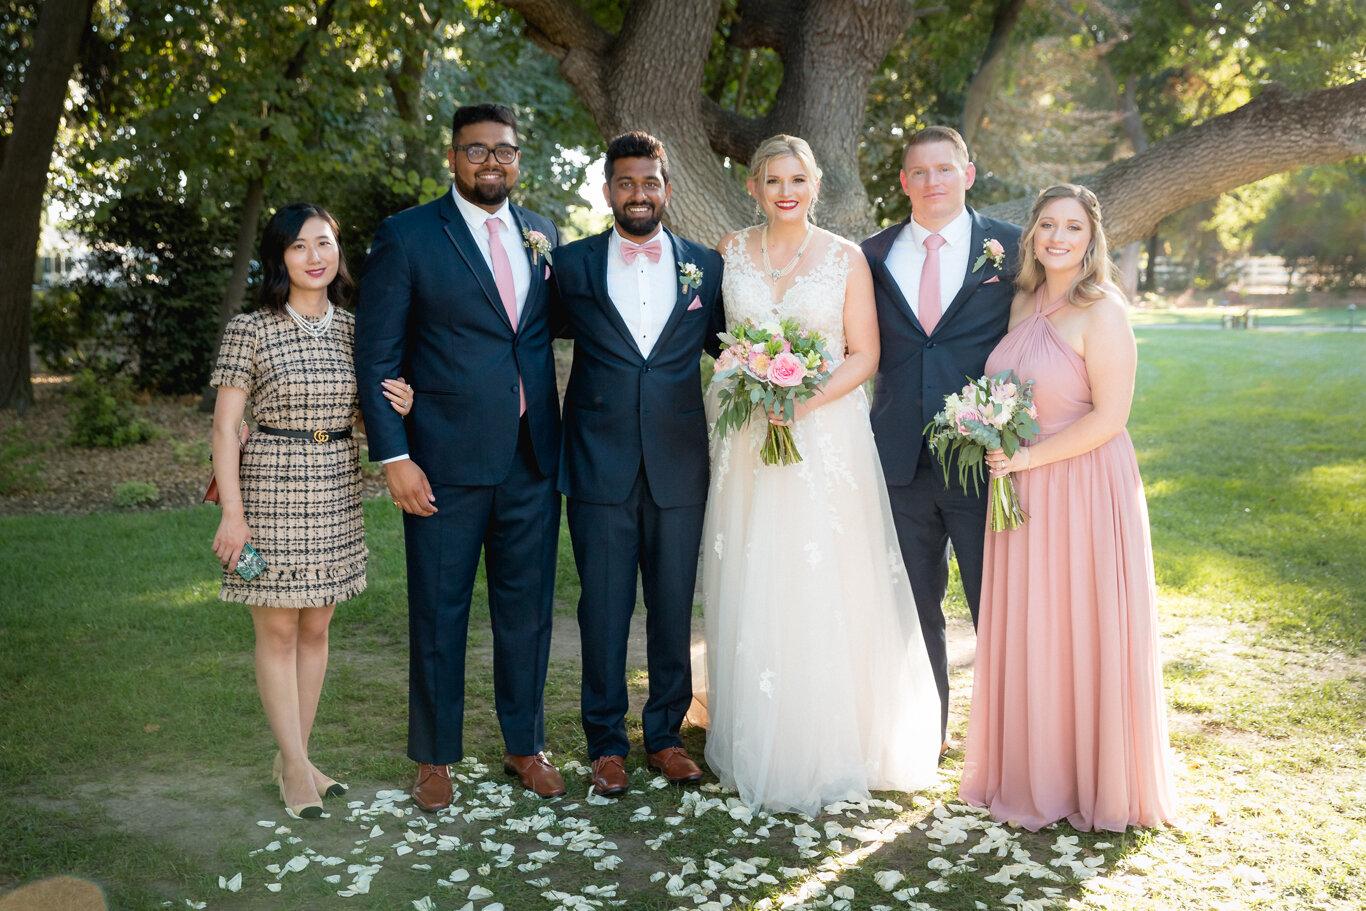 2019.08.24_Emily-Ashir-Wedding-at-the-Maples-5982.jpg